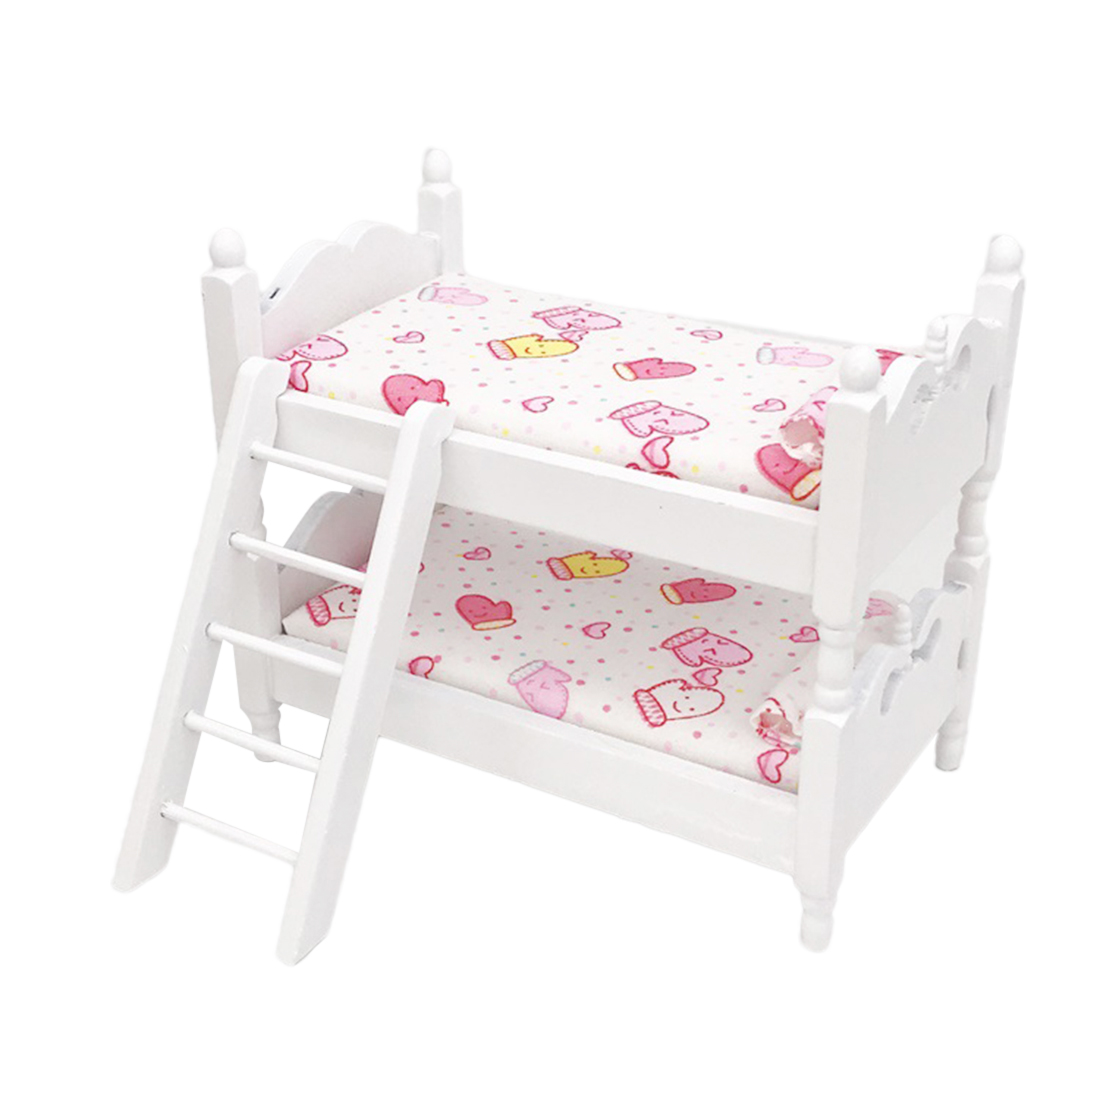 1:12 Miniature Princess Bunk Bed Model Dollhouse Bedroom DIY Kits Purple